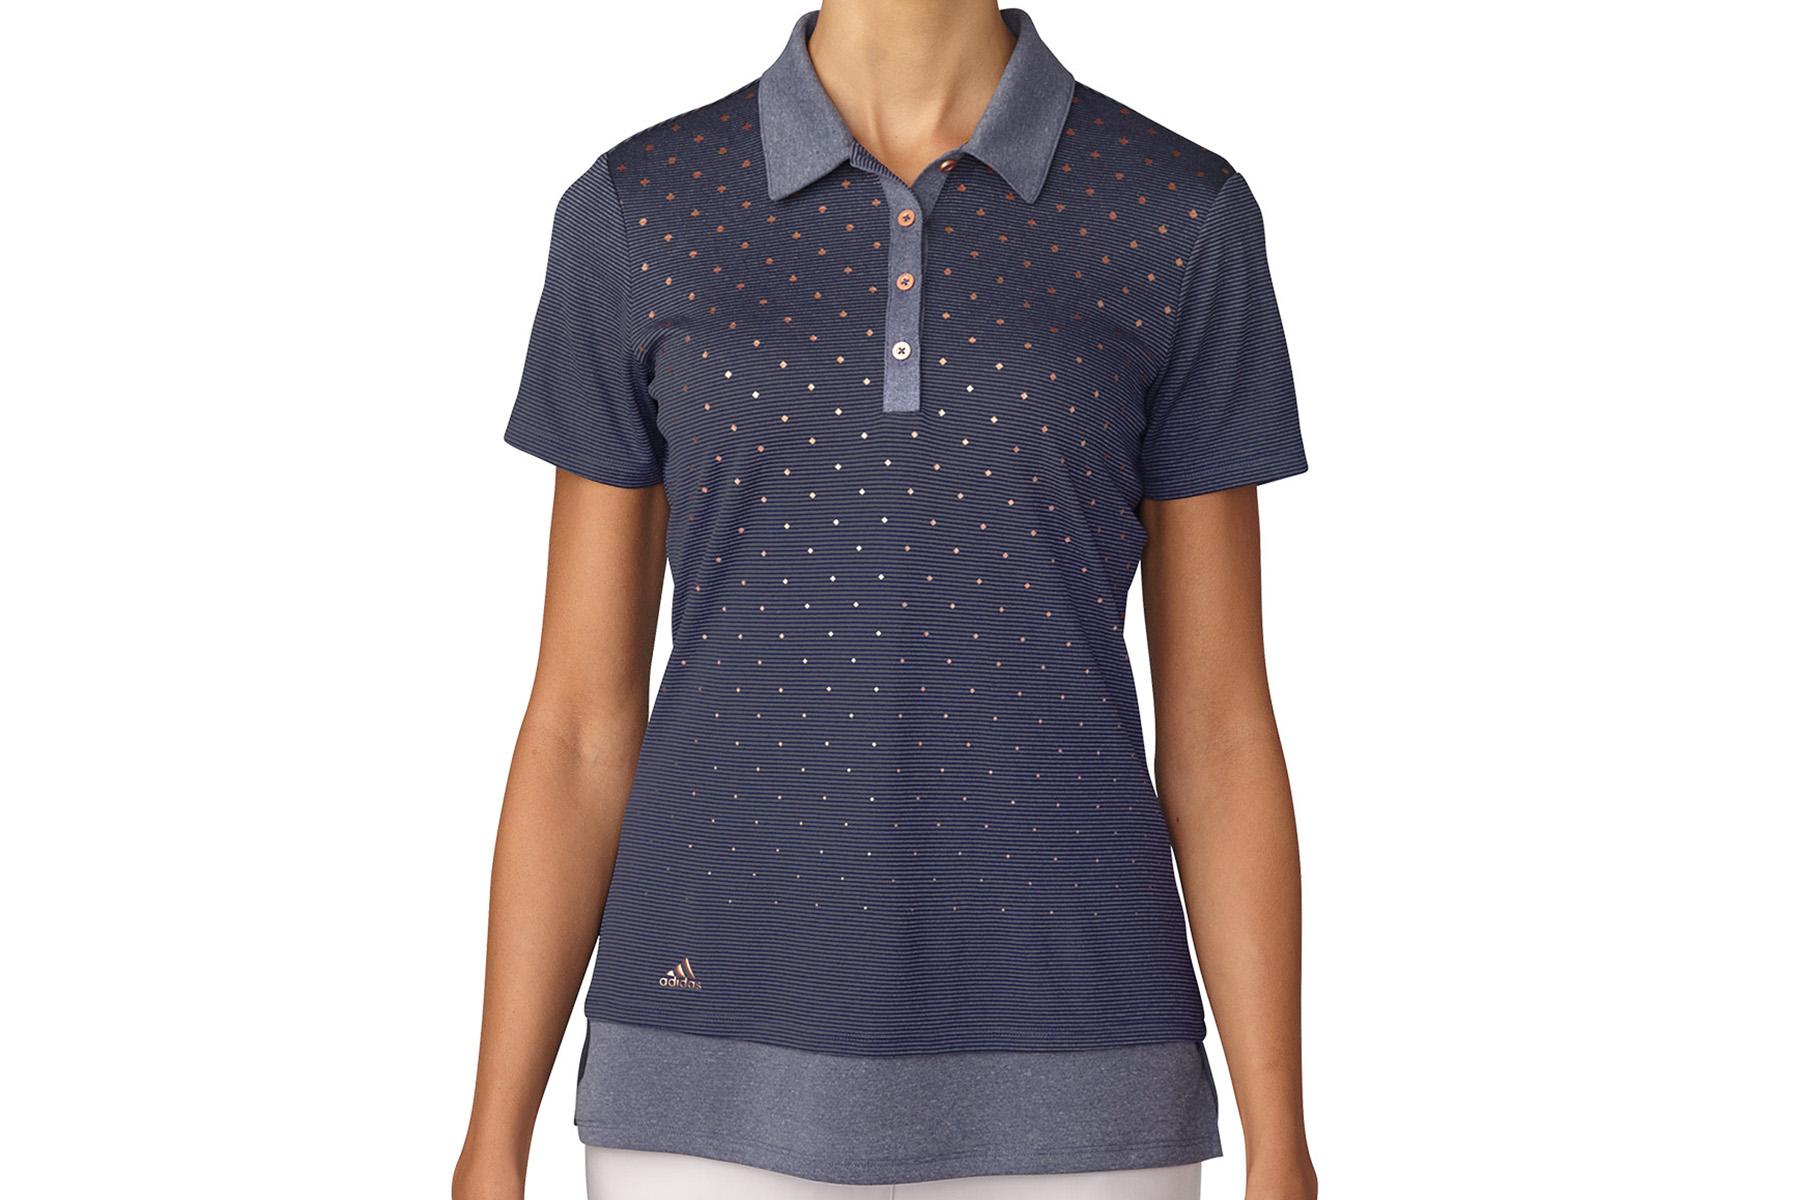 polo adidas golf printed pour femmes online golf. Black Bedroom Furniture Sets. Home Design Ideas